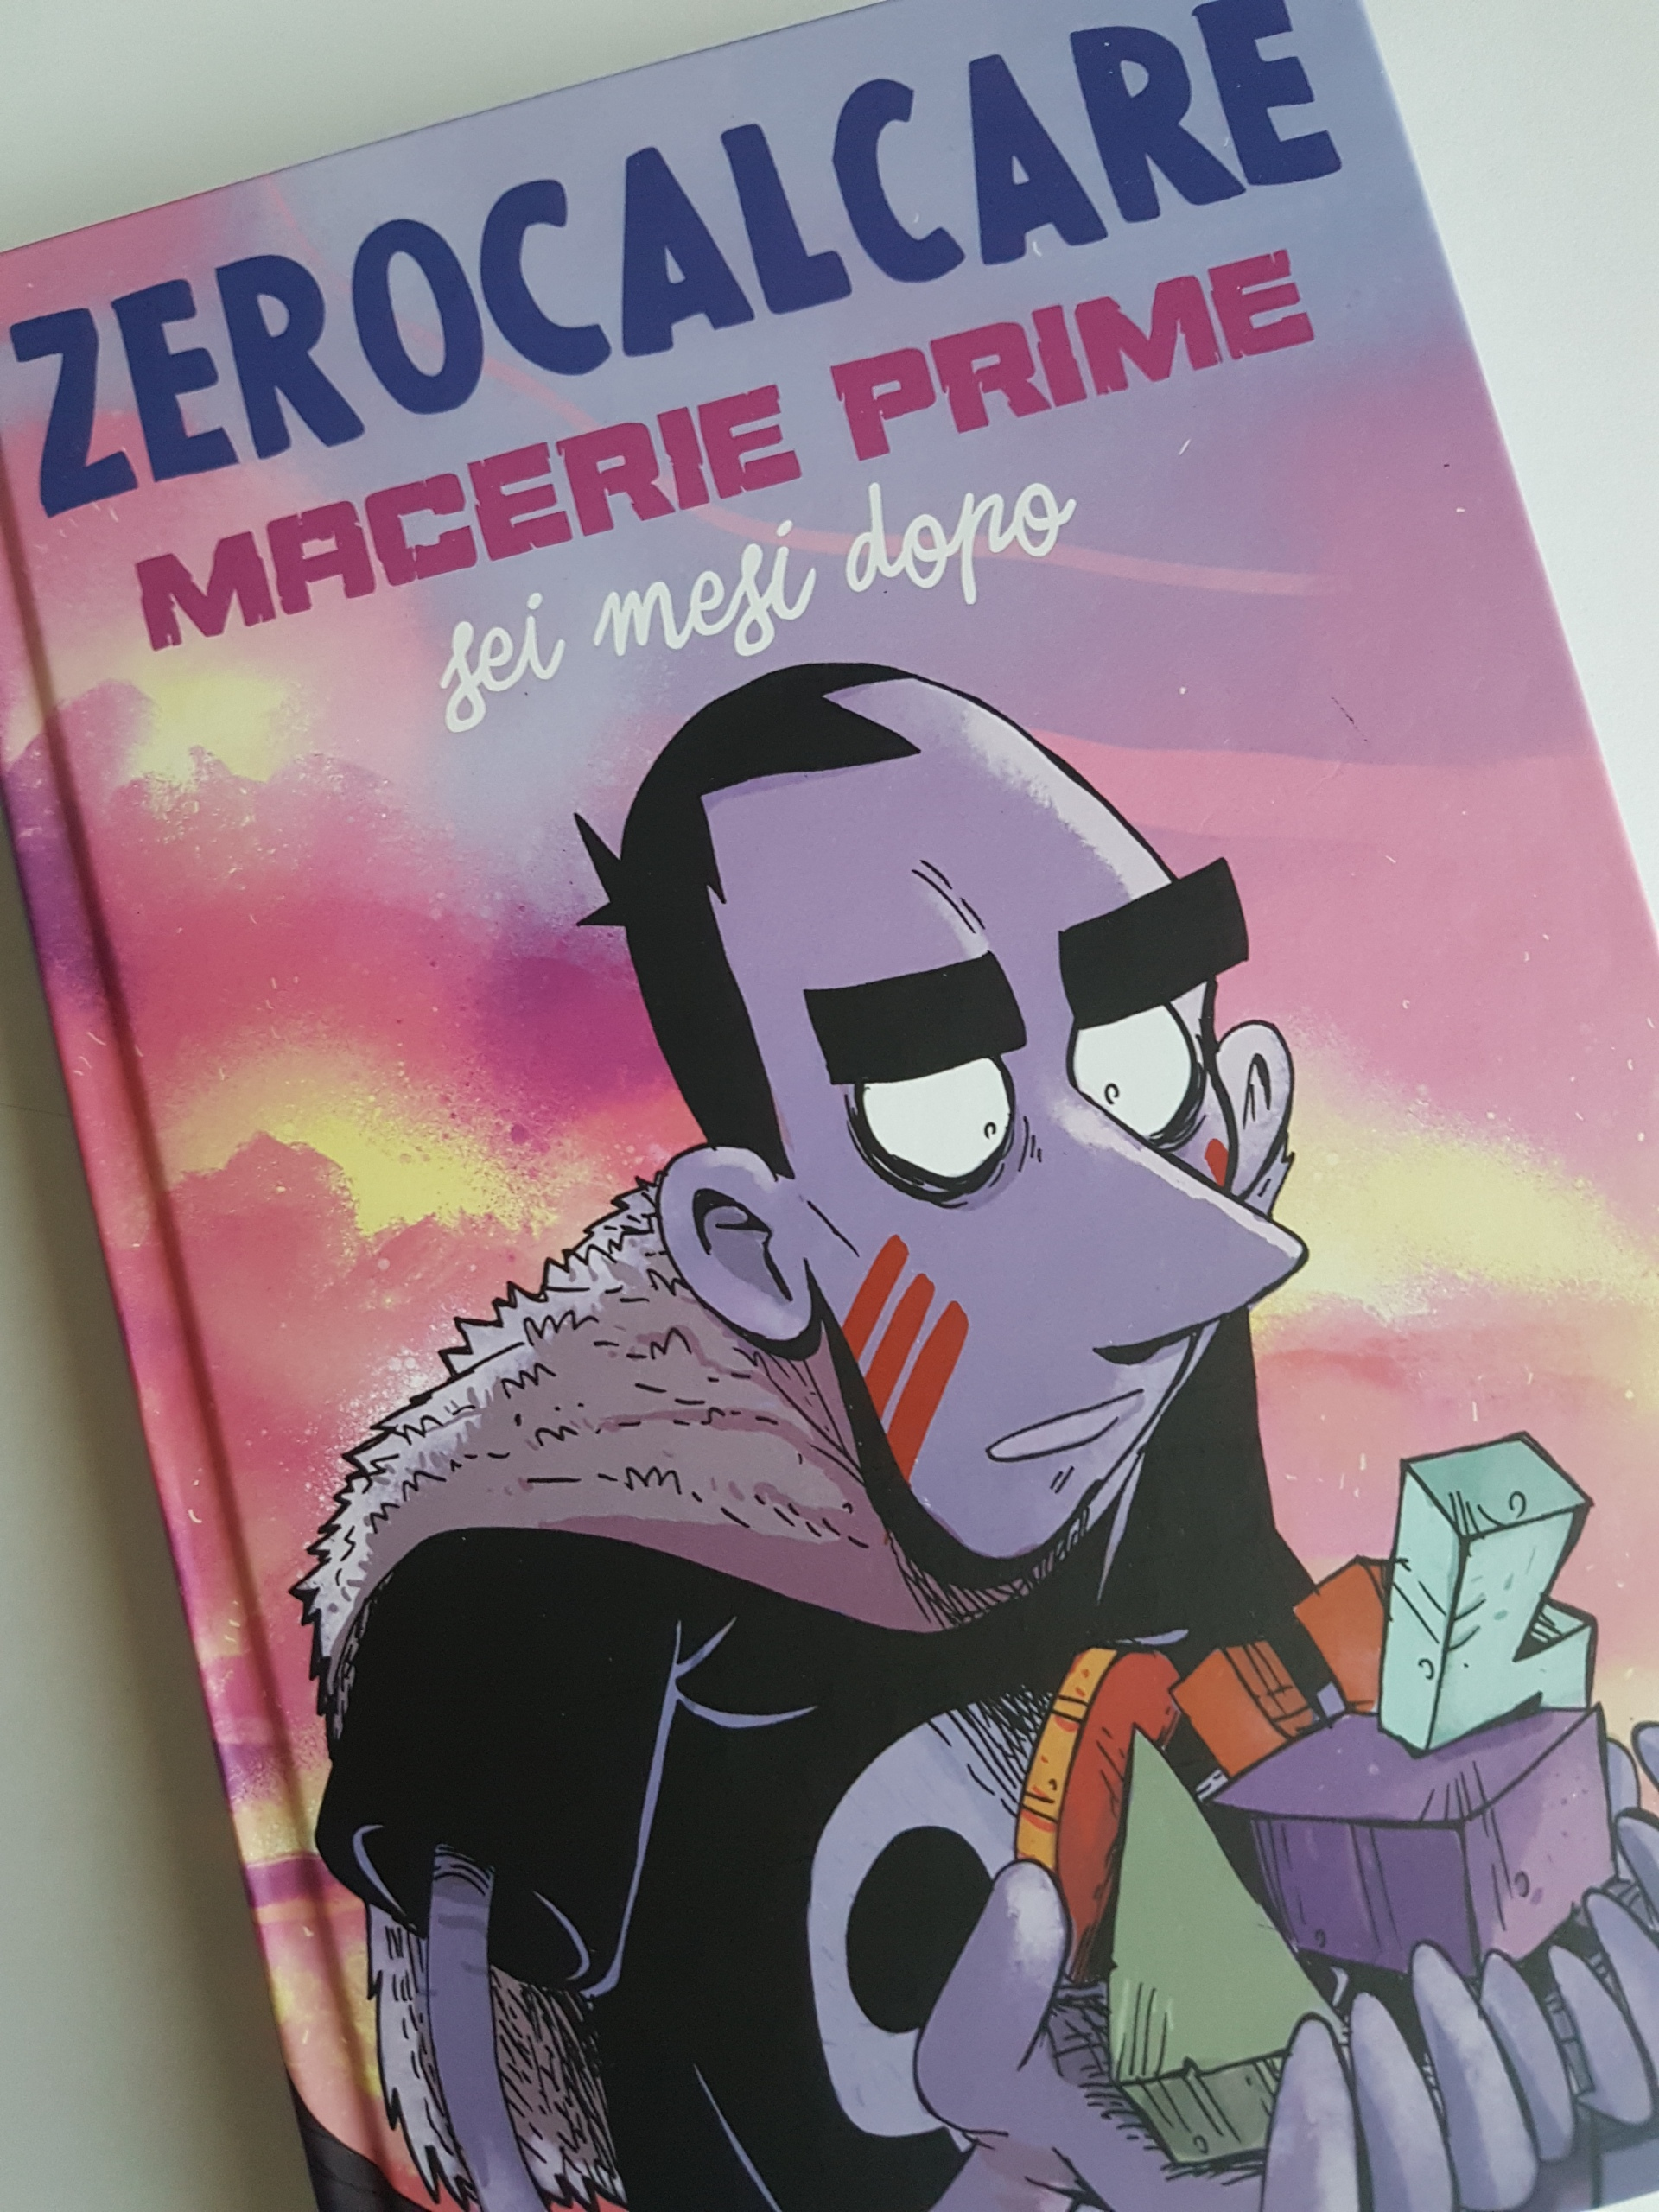 Zzerocalcare - Macerie prime - ROA Rivista Online d'Avanguardia